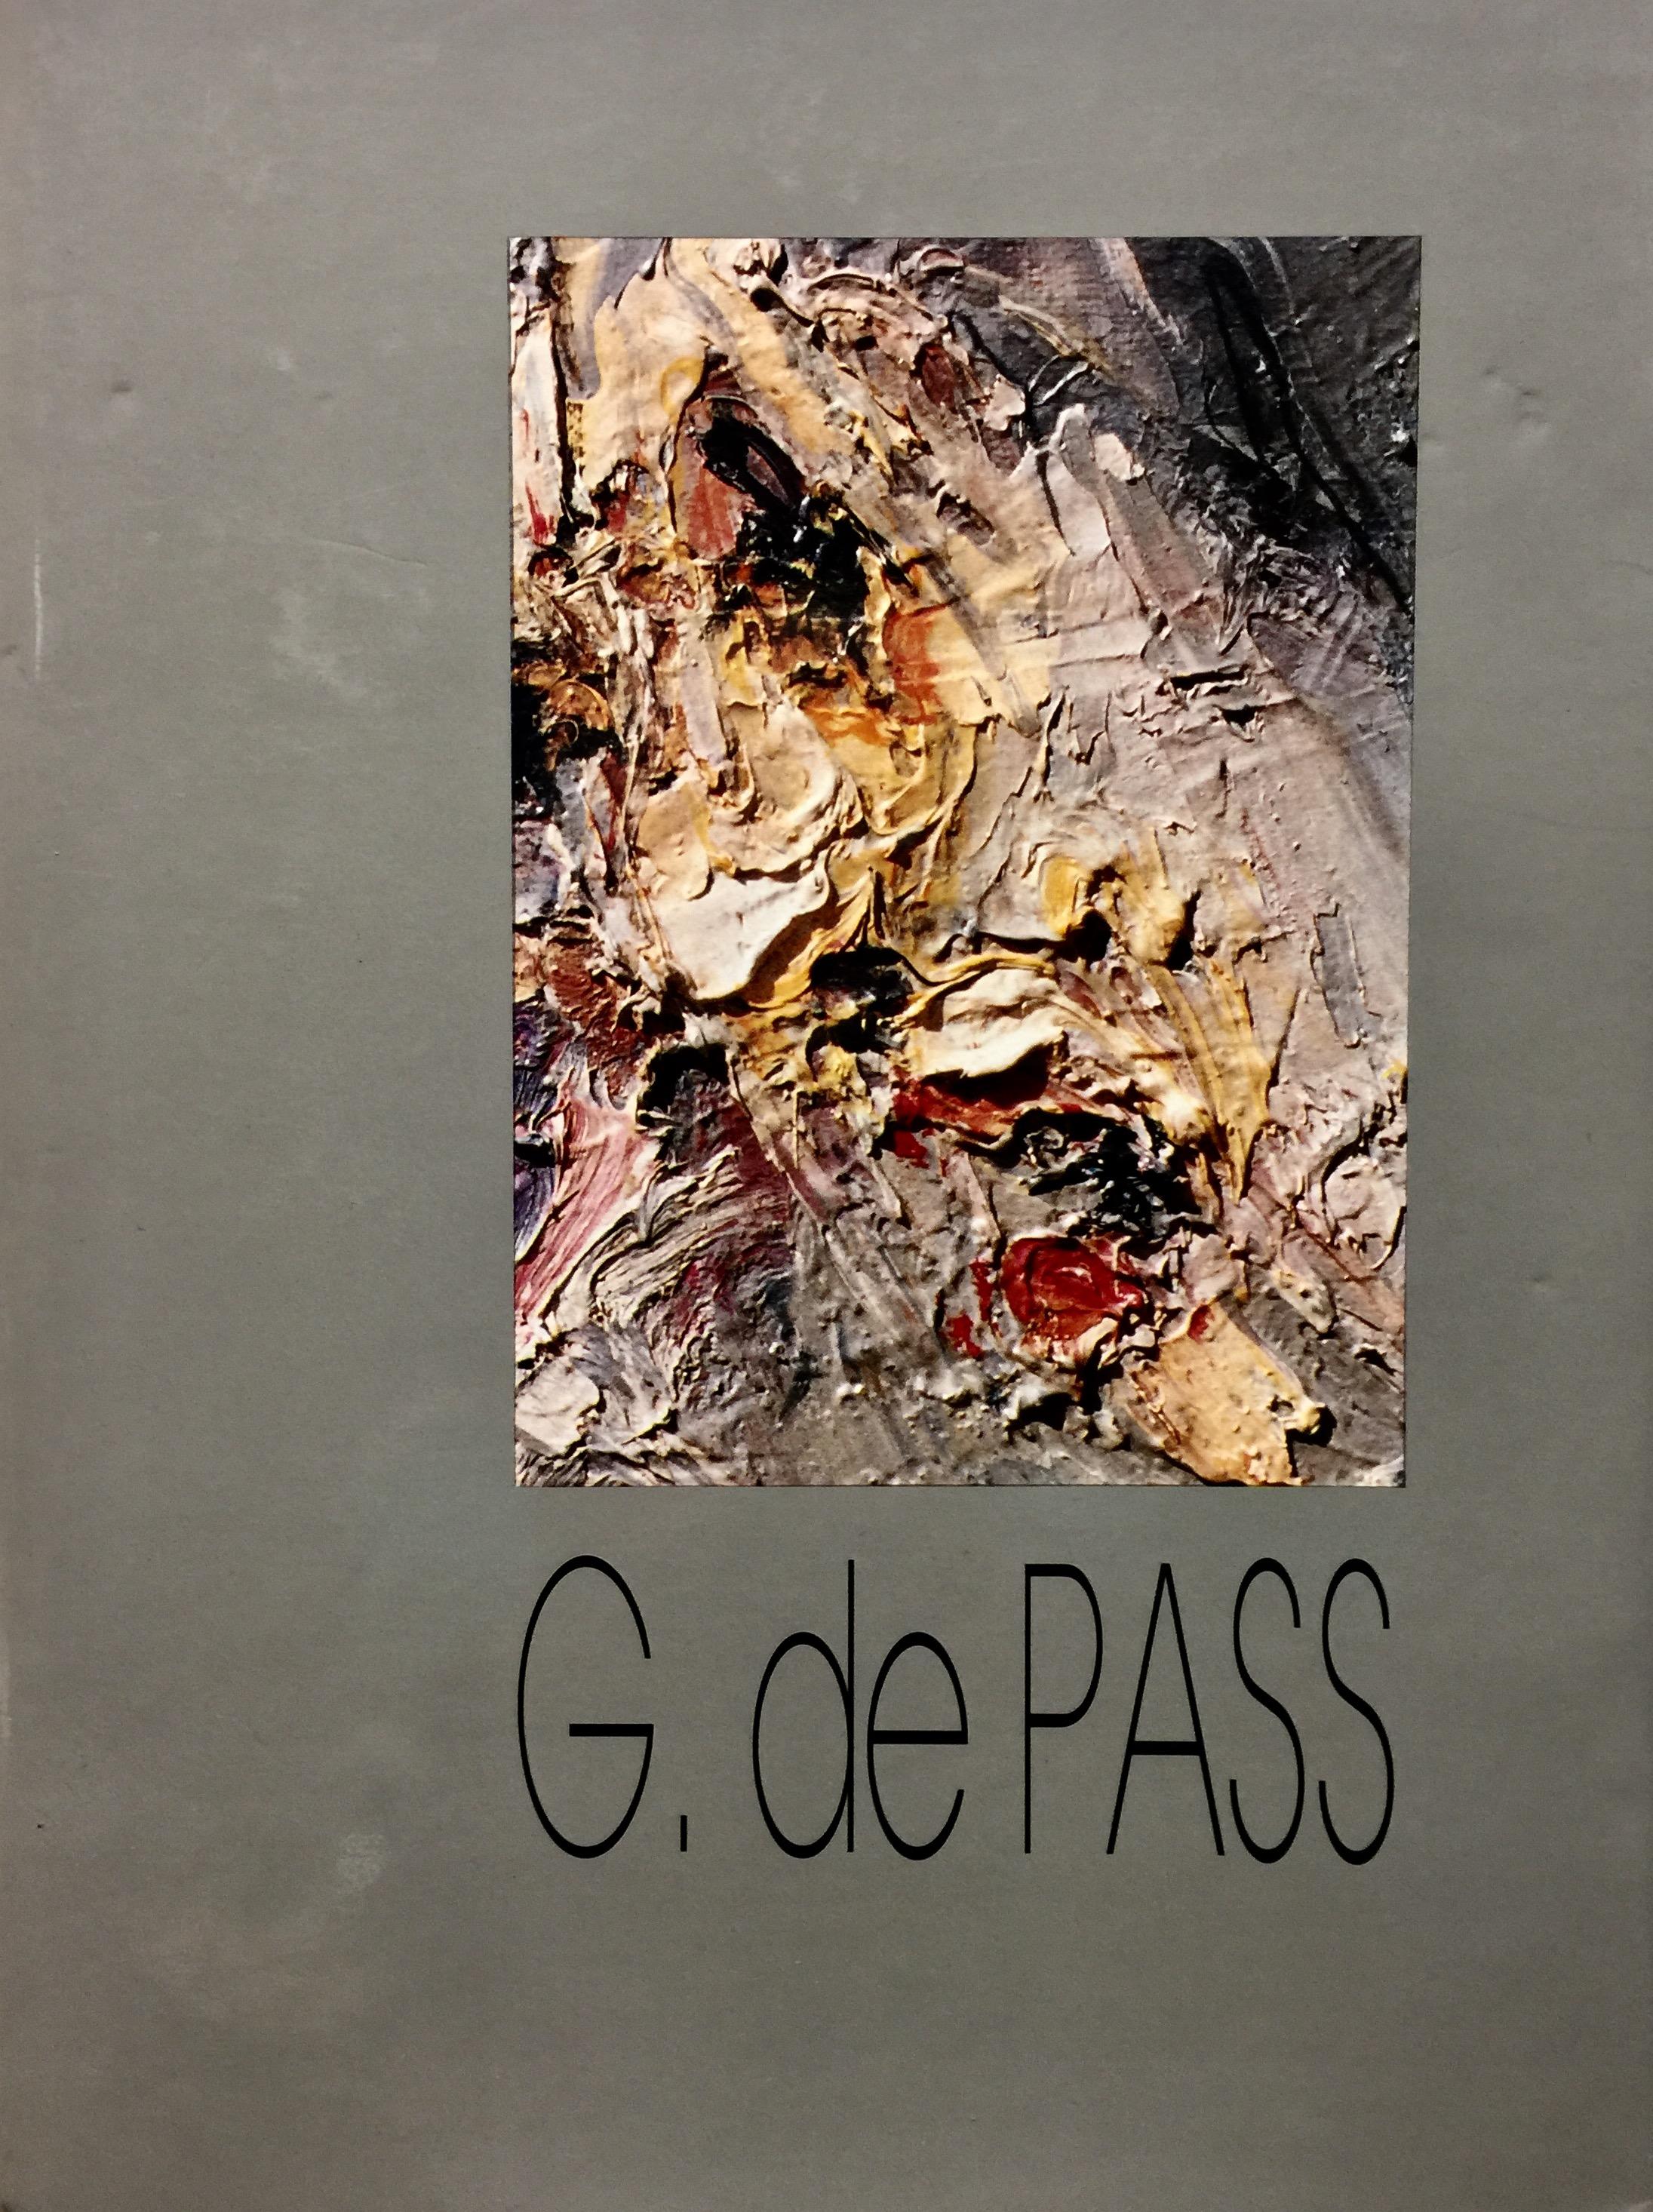 G. de Pass expressionniste